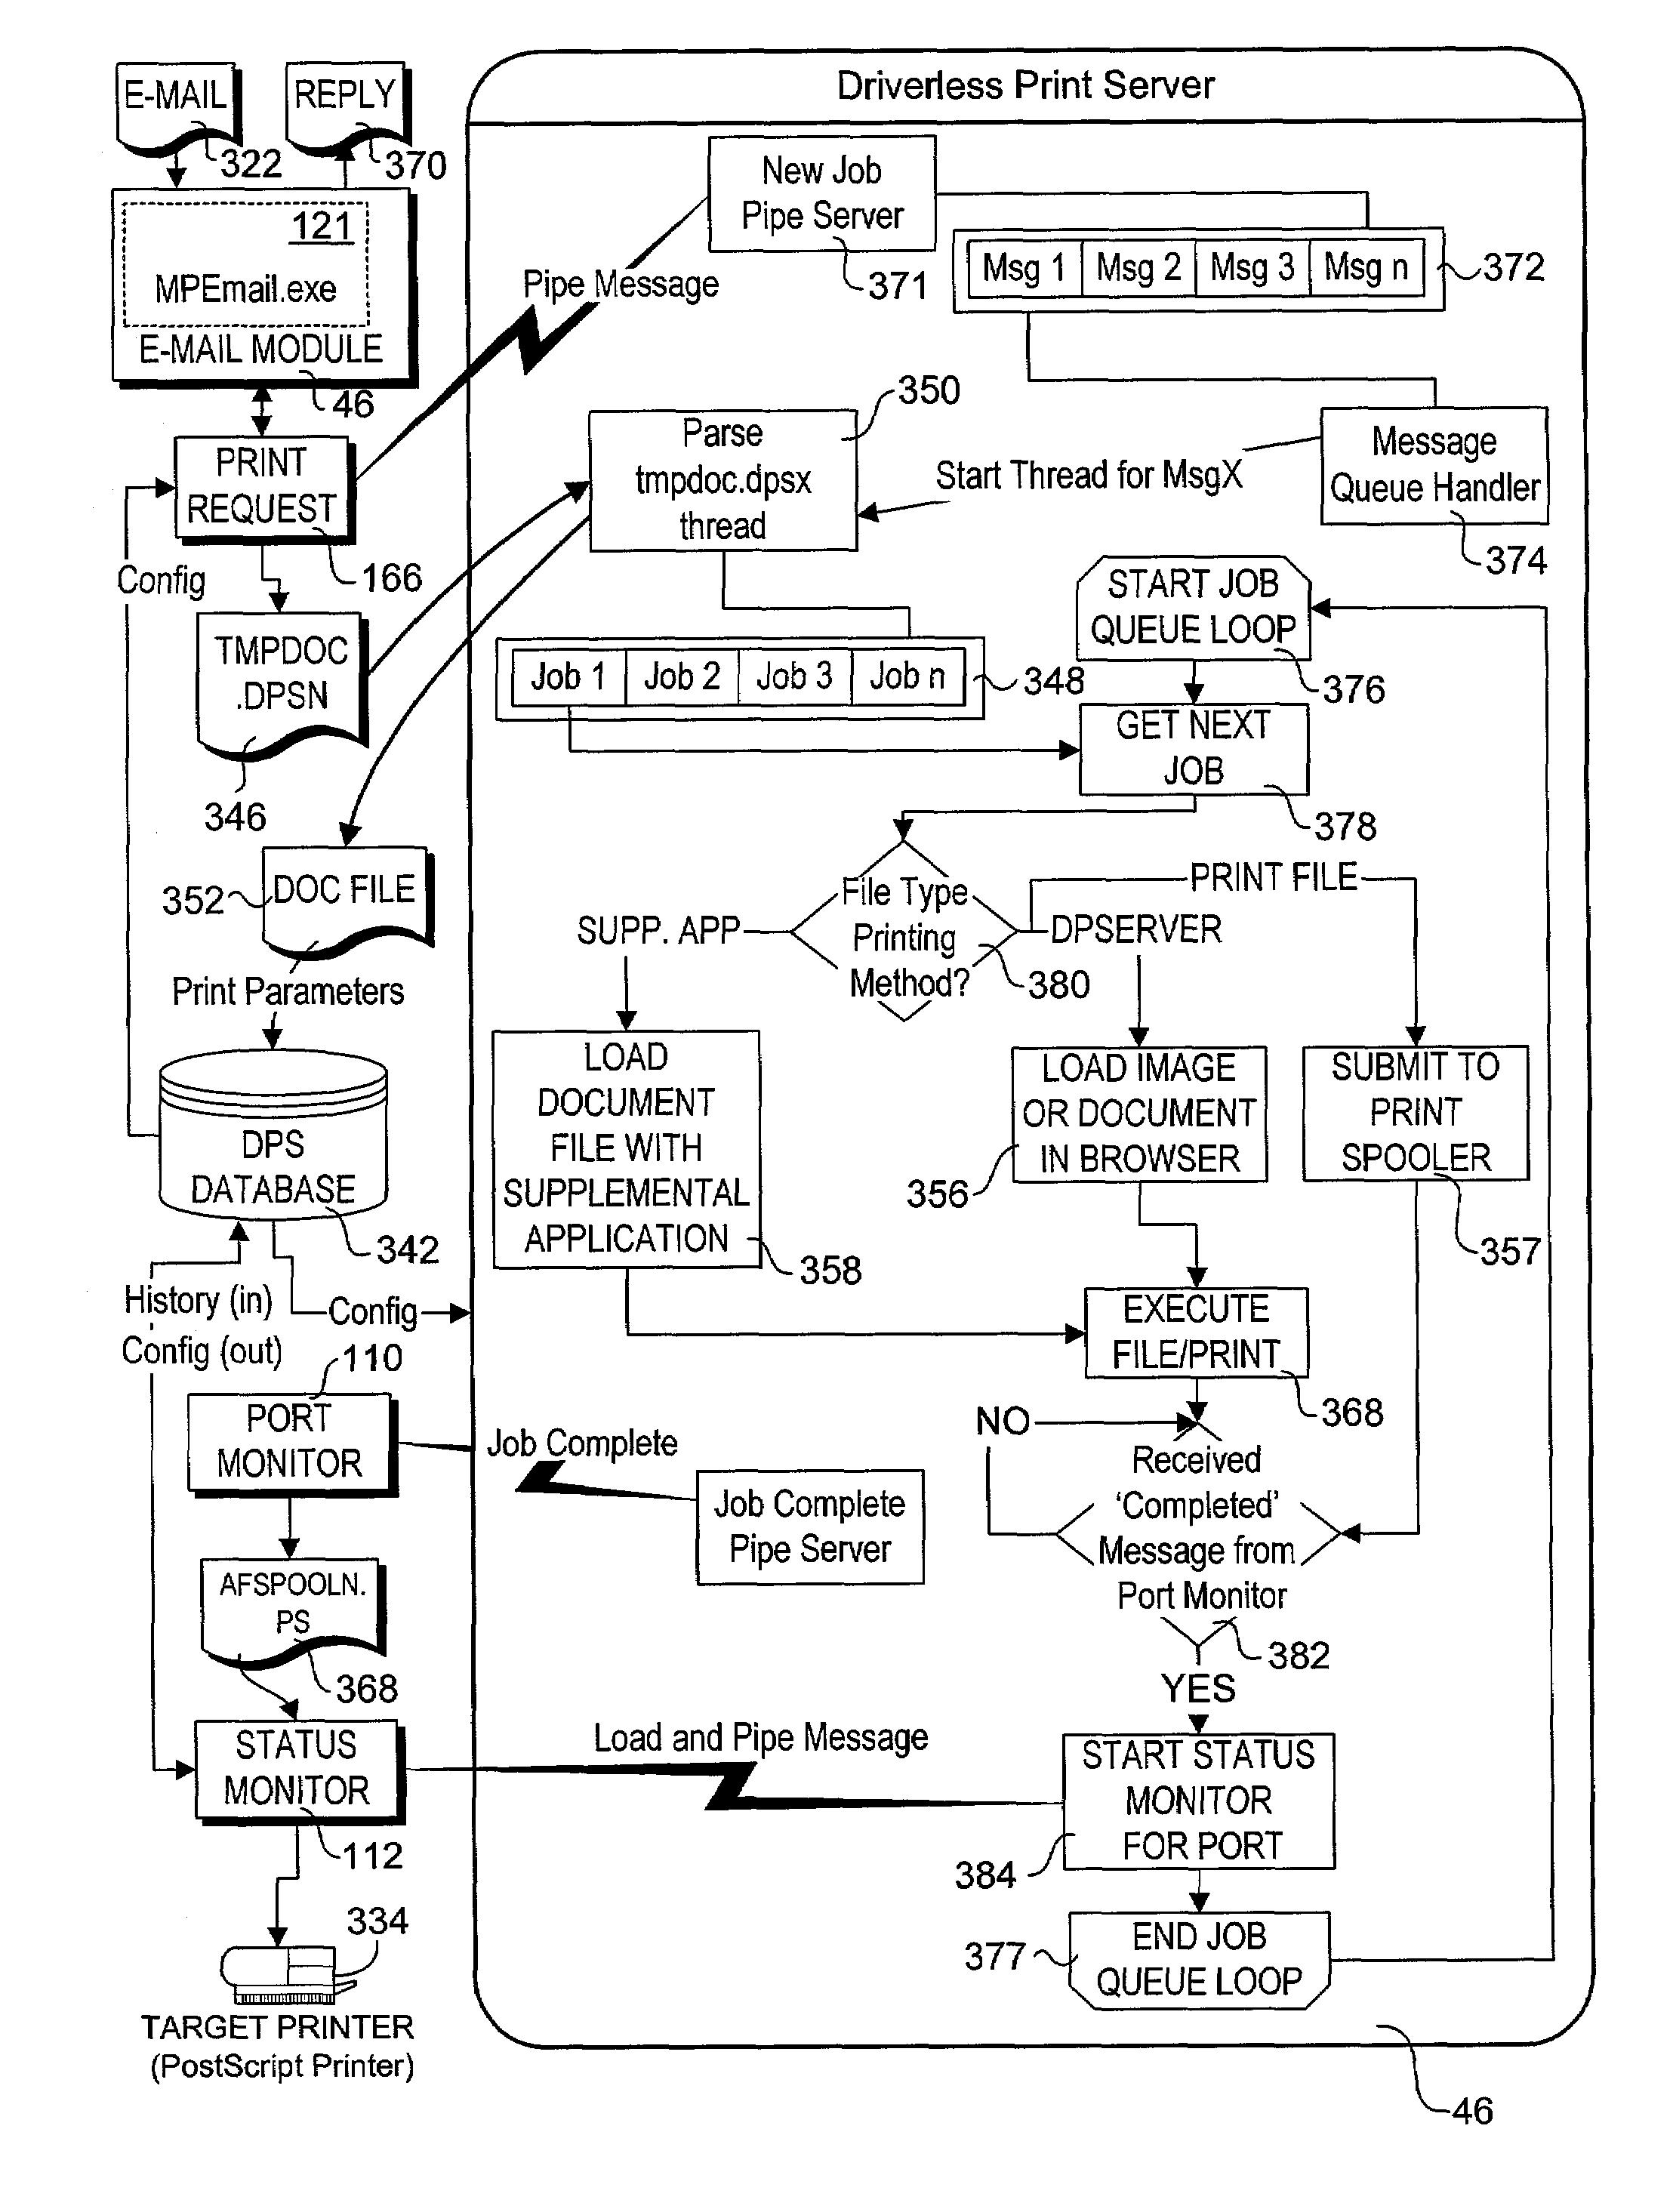 patent us 6 993 562 b2 Simple Logic Diagram first claim